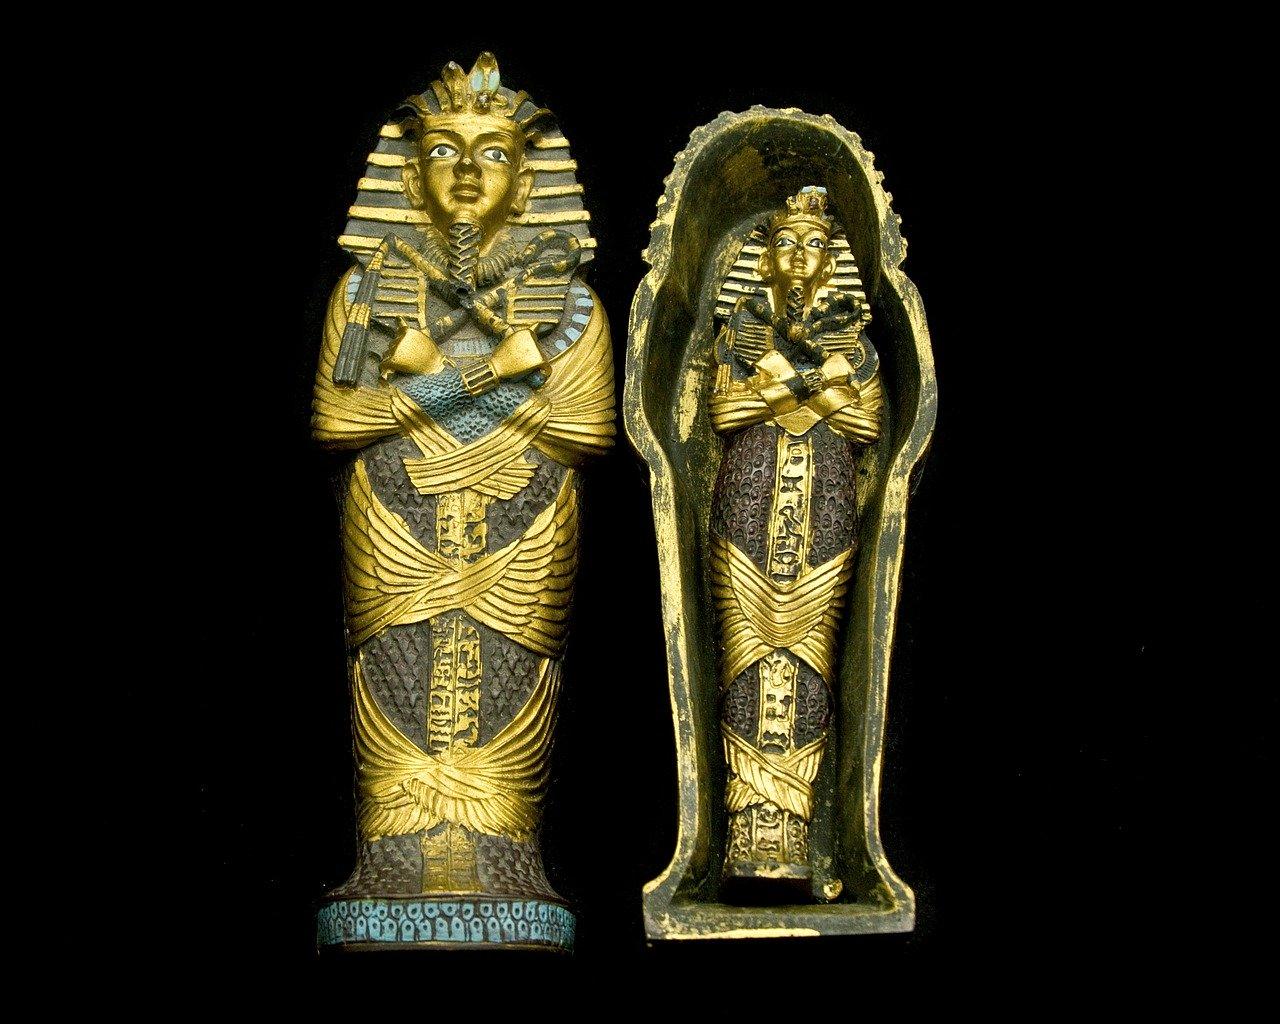 1589475227-sarcophagus-469273-1280-1.jpeg